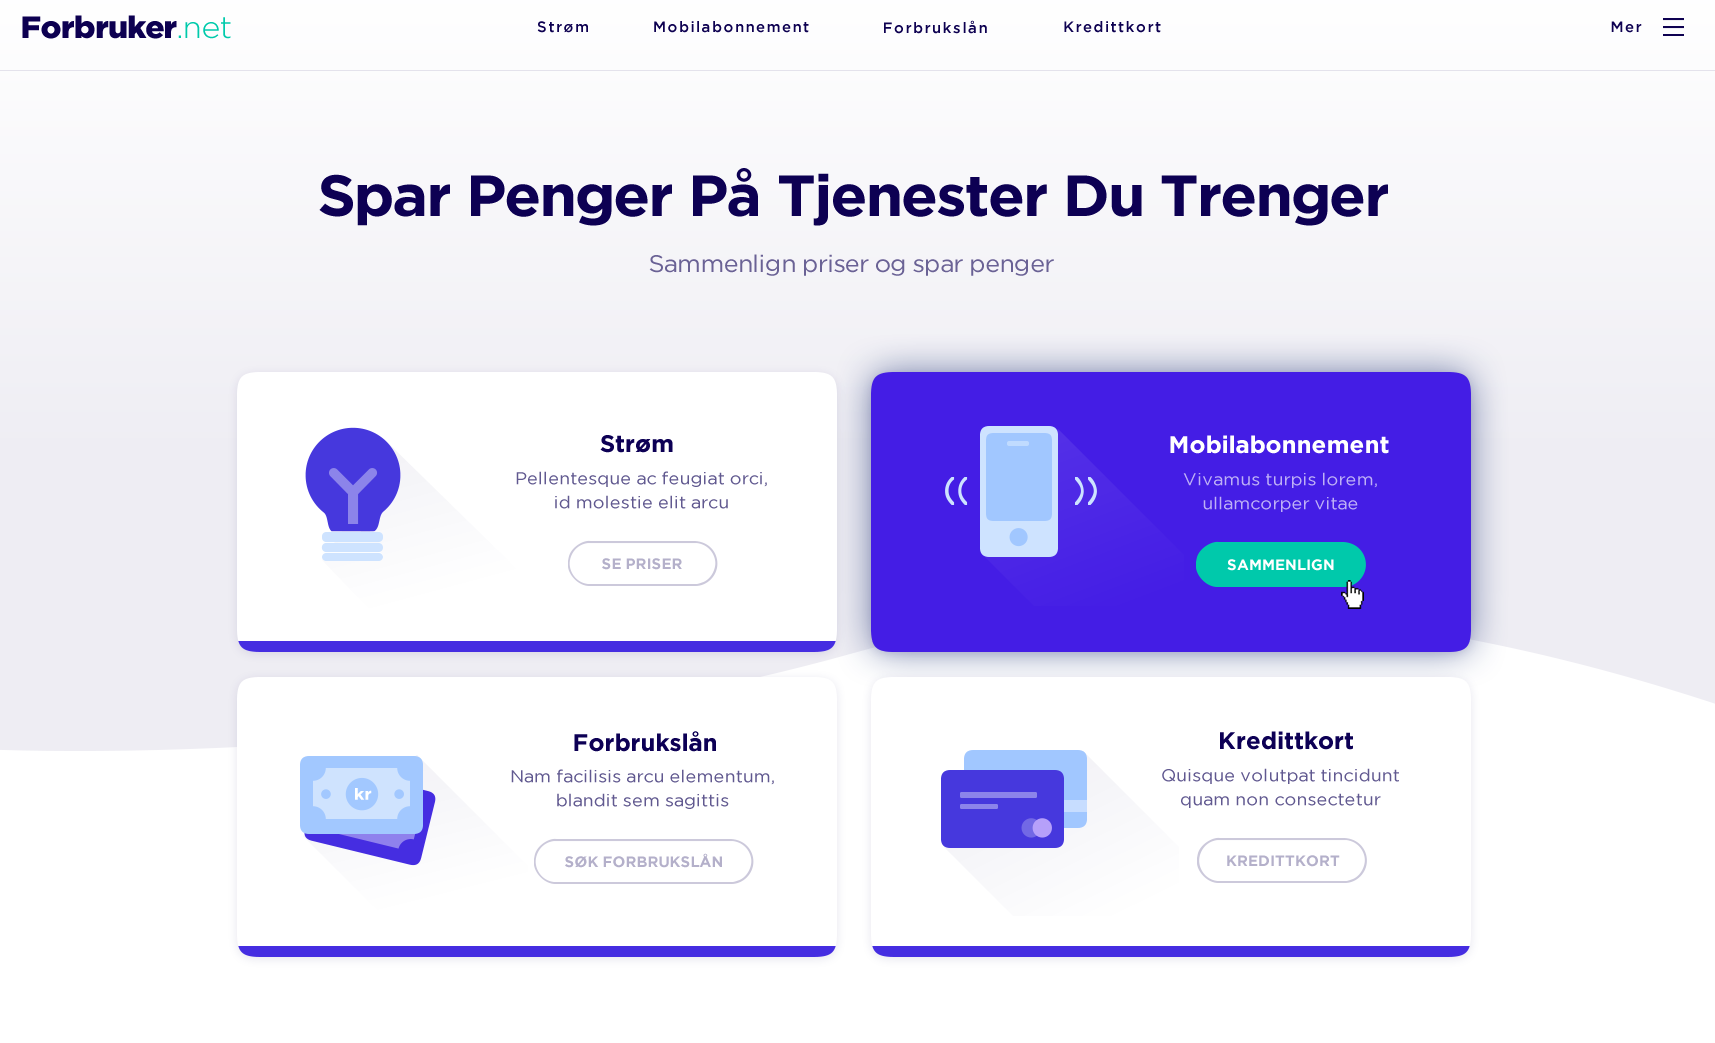 Web design in flat style